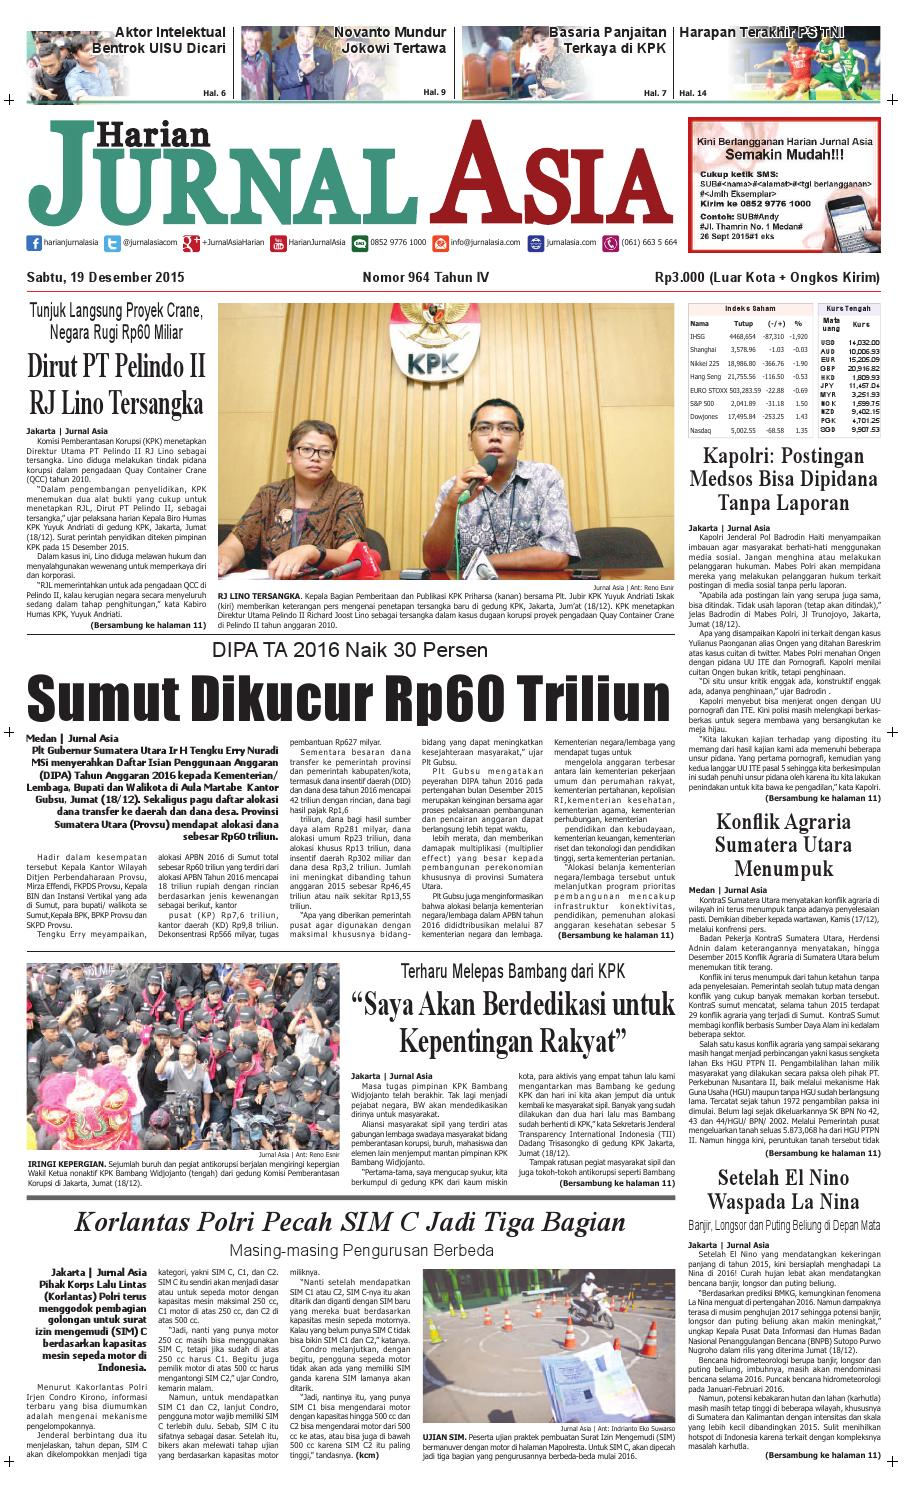 Harian Jurnal Asia Edisi Sabtu 19 Desember 2015 By Parcel Keramik Pja 1644 Medan Issuu